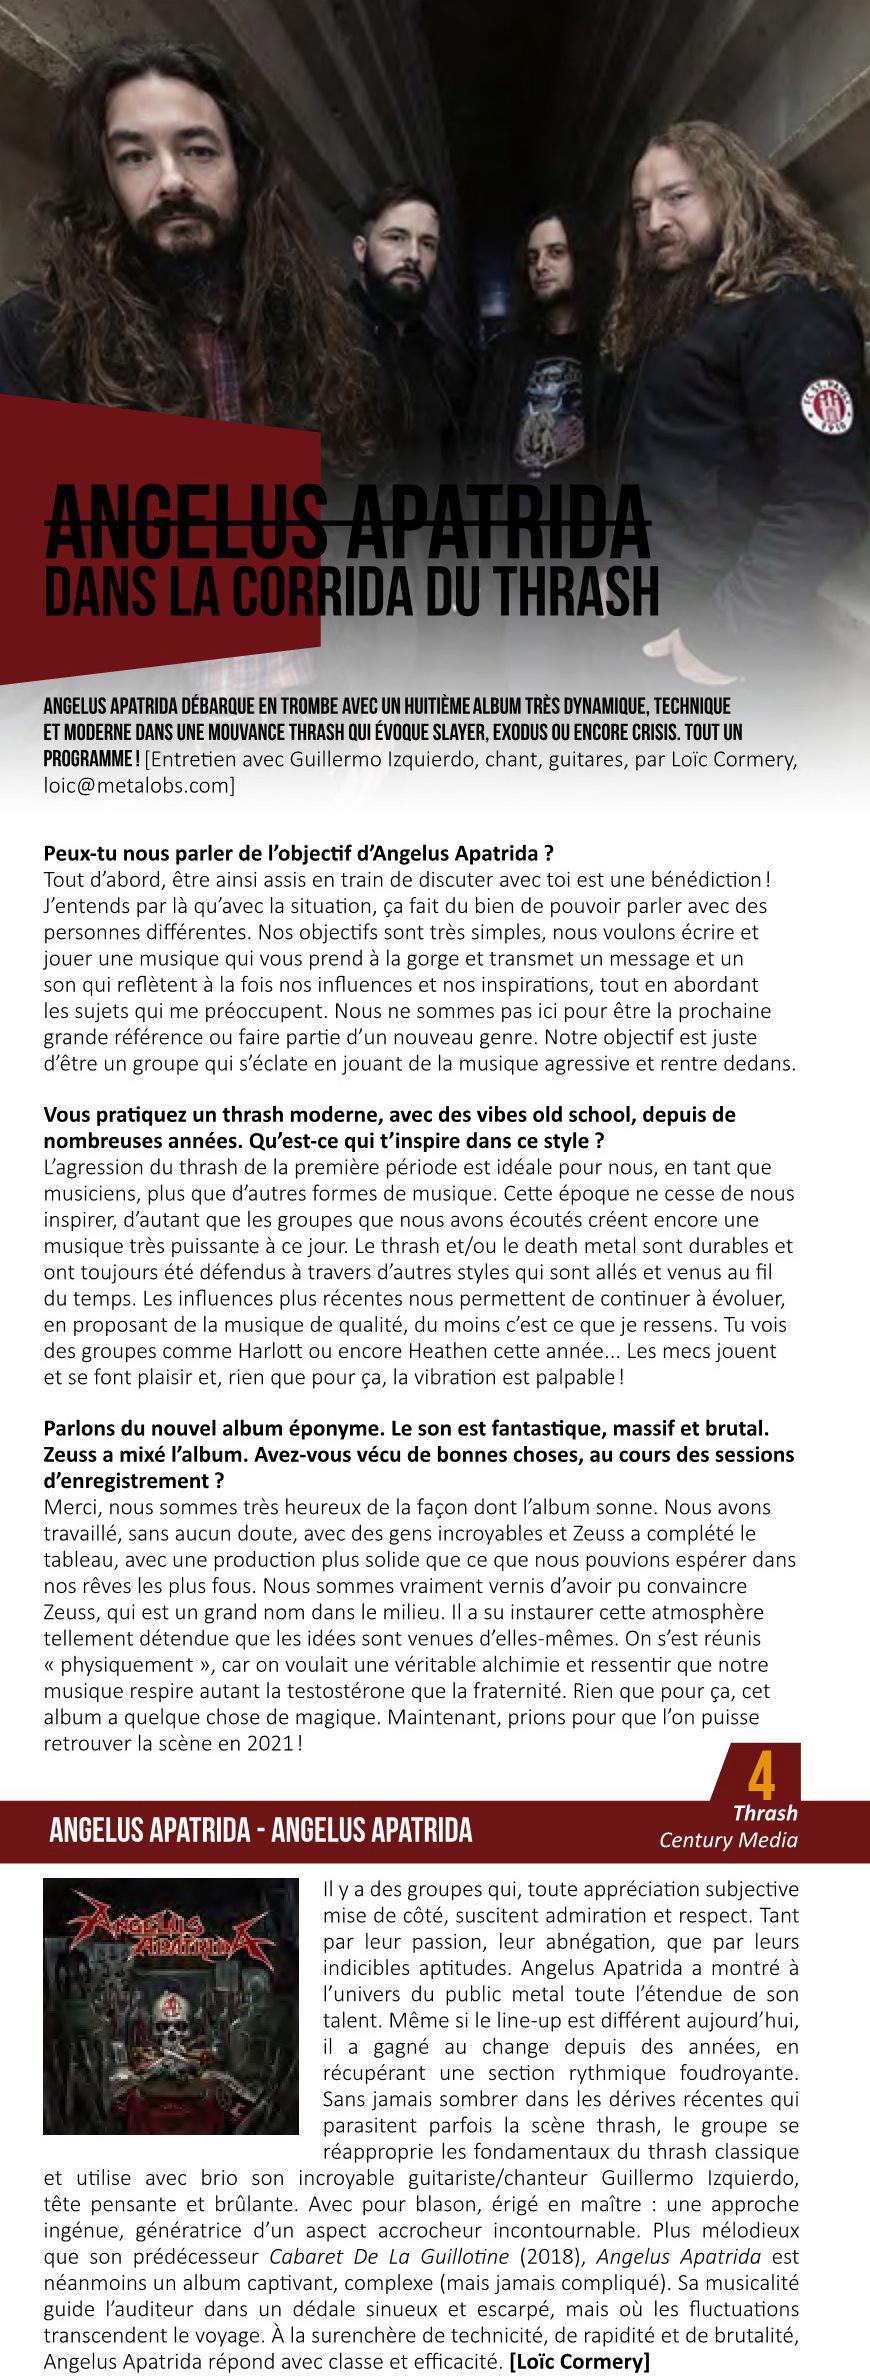 ANGELUS APATRIDA  [an-je-lus / a-pa-tri-da] le 5 Février 2021 Angelu10